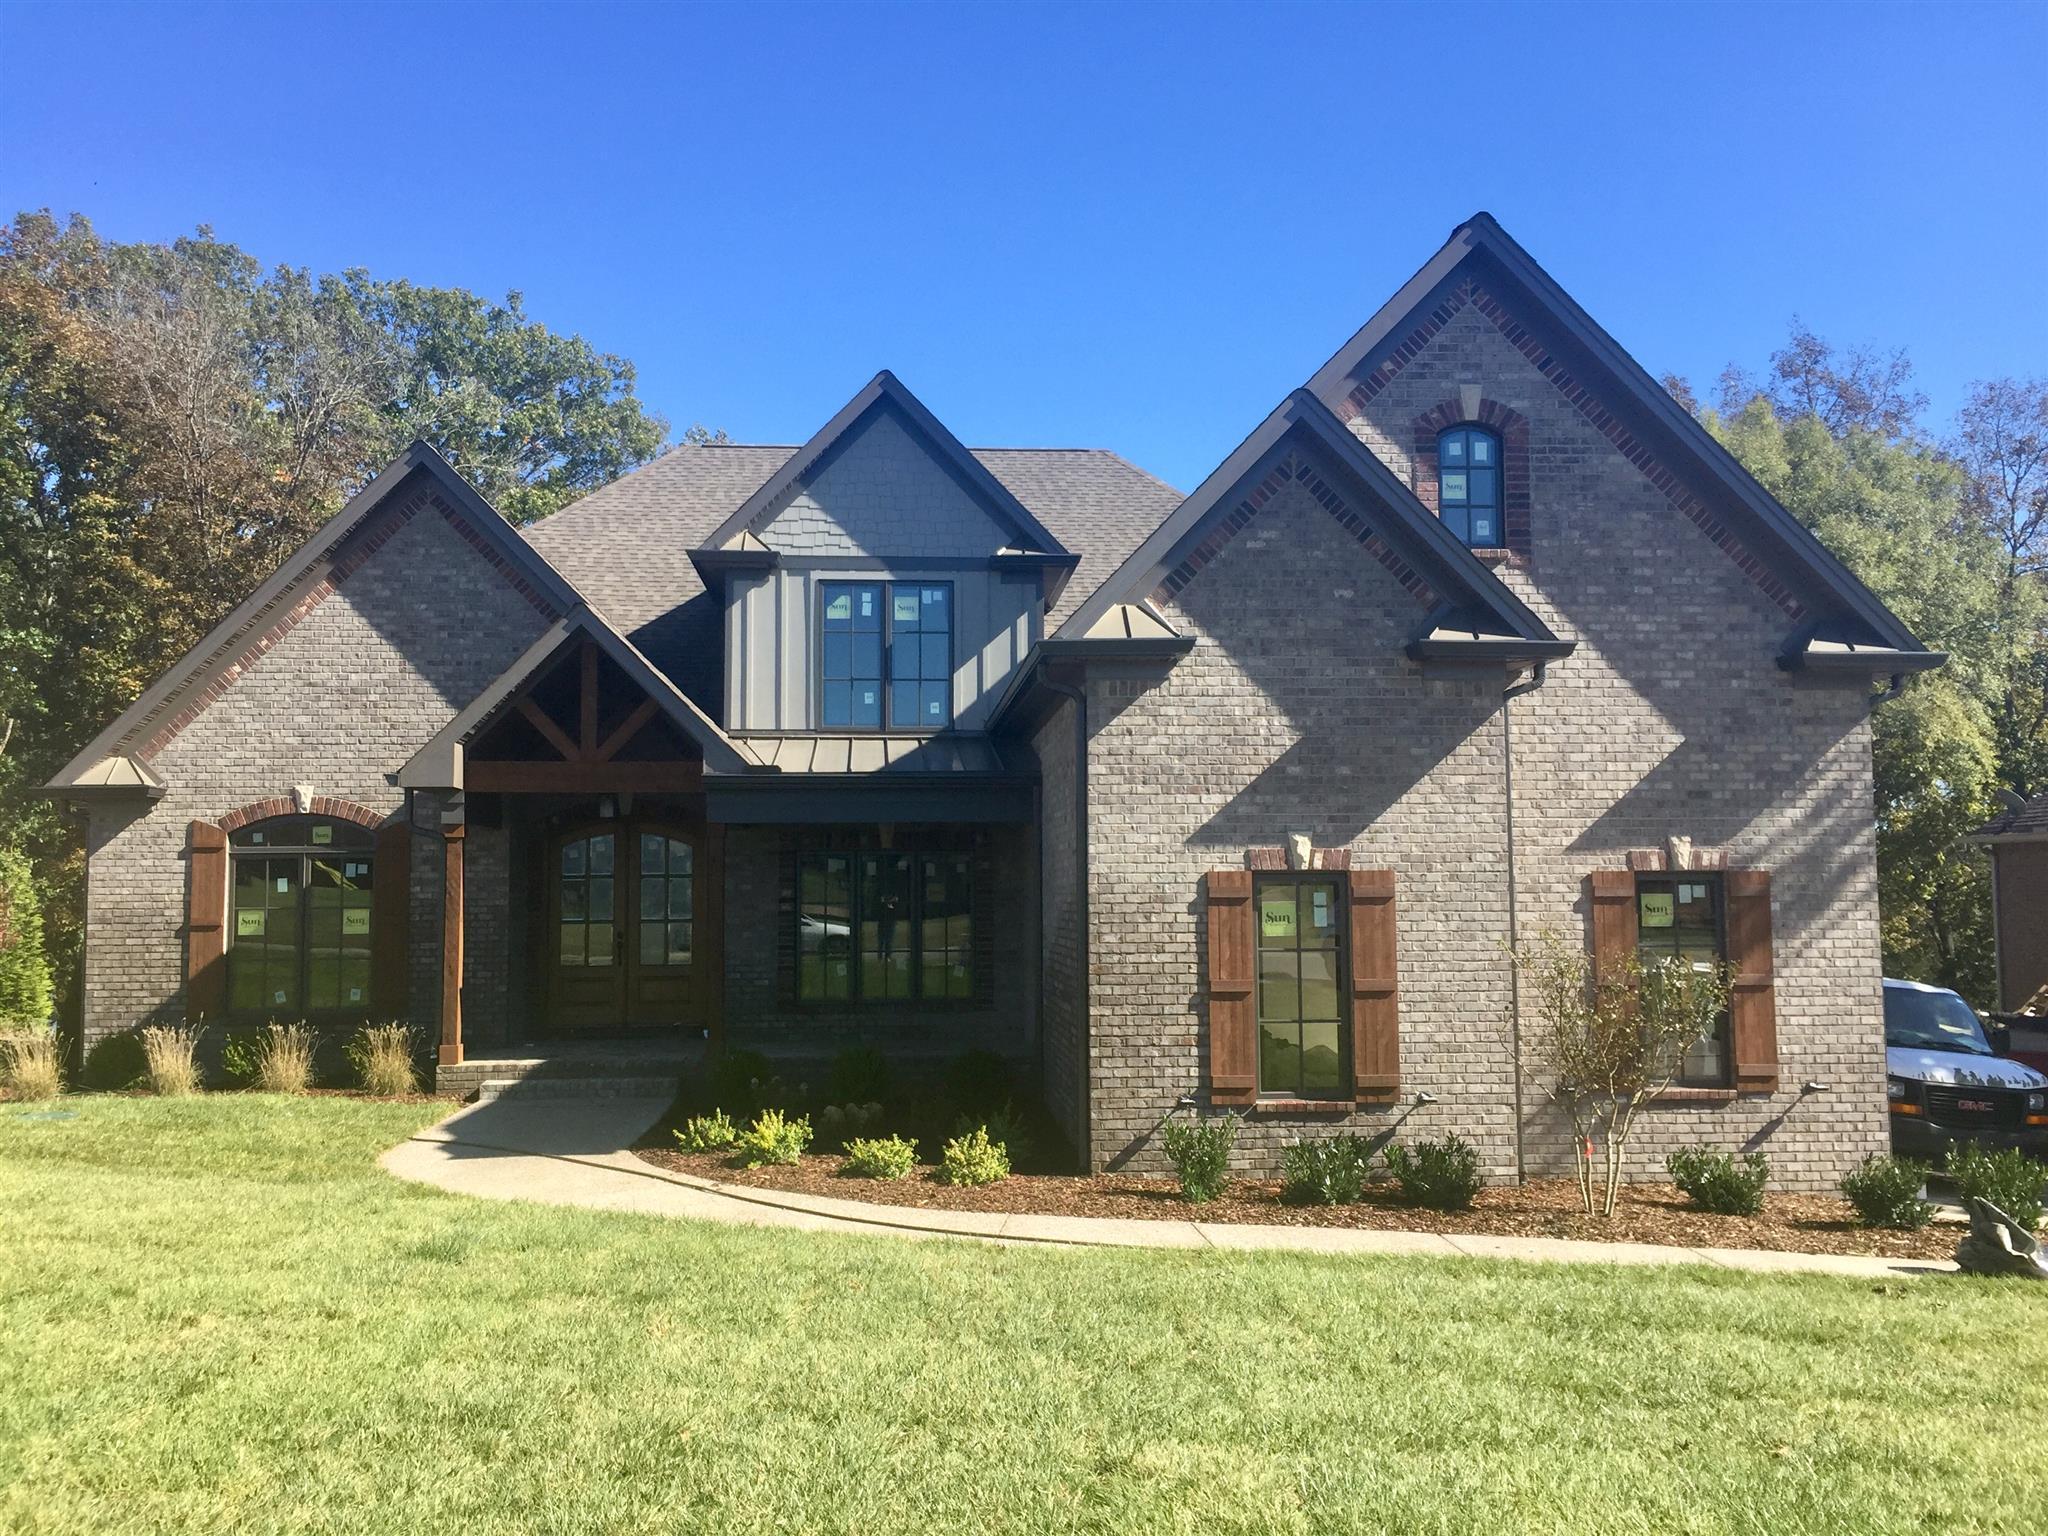 1008 Stone Brook Cv, Lebanon, TN 37087 - Lebanon, TN real estate listing